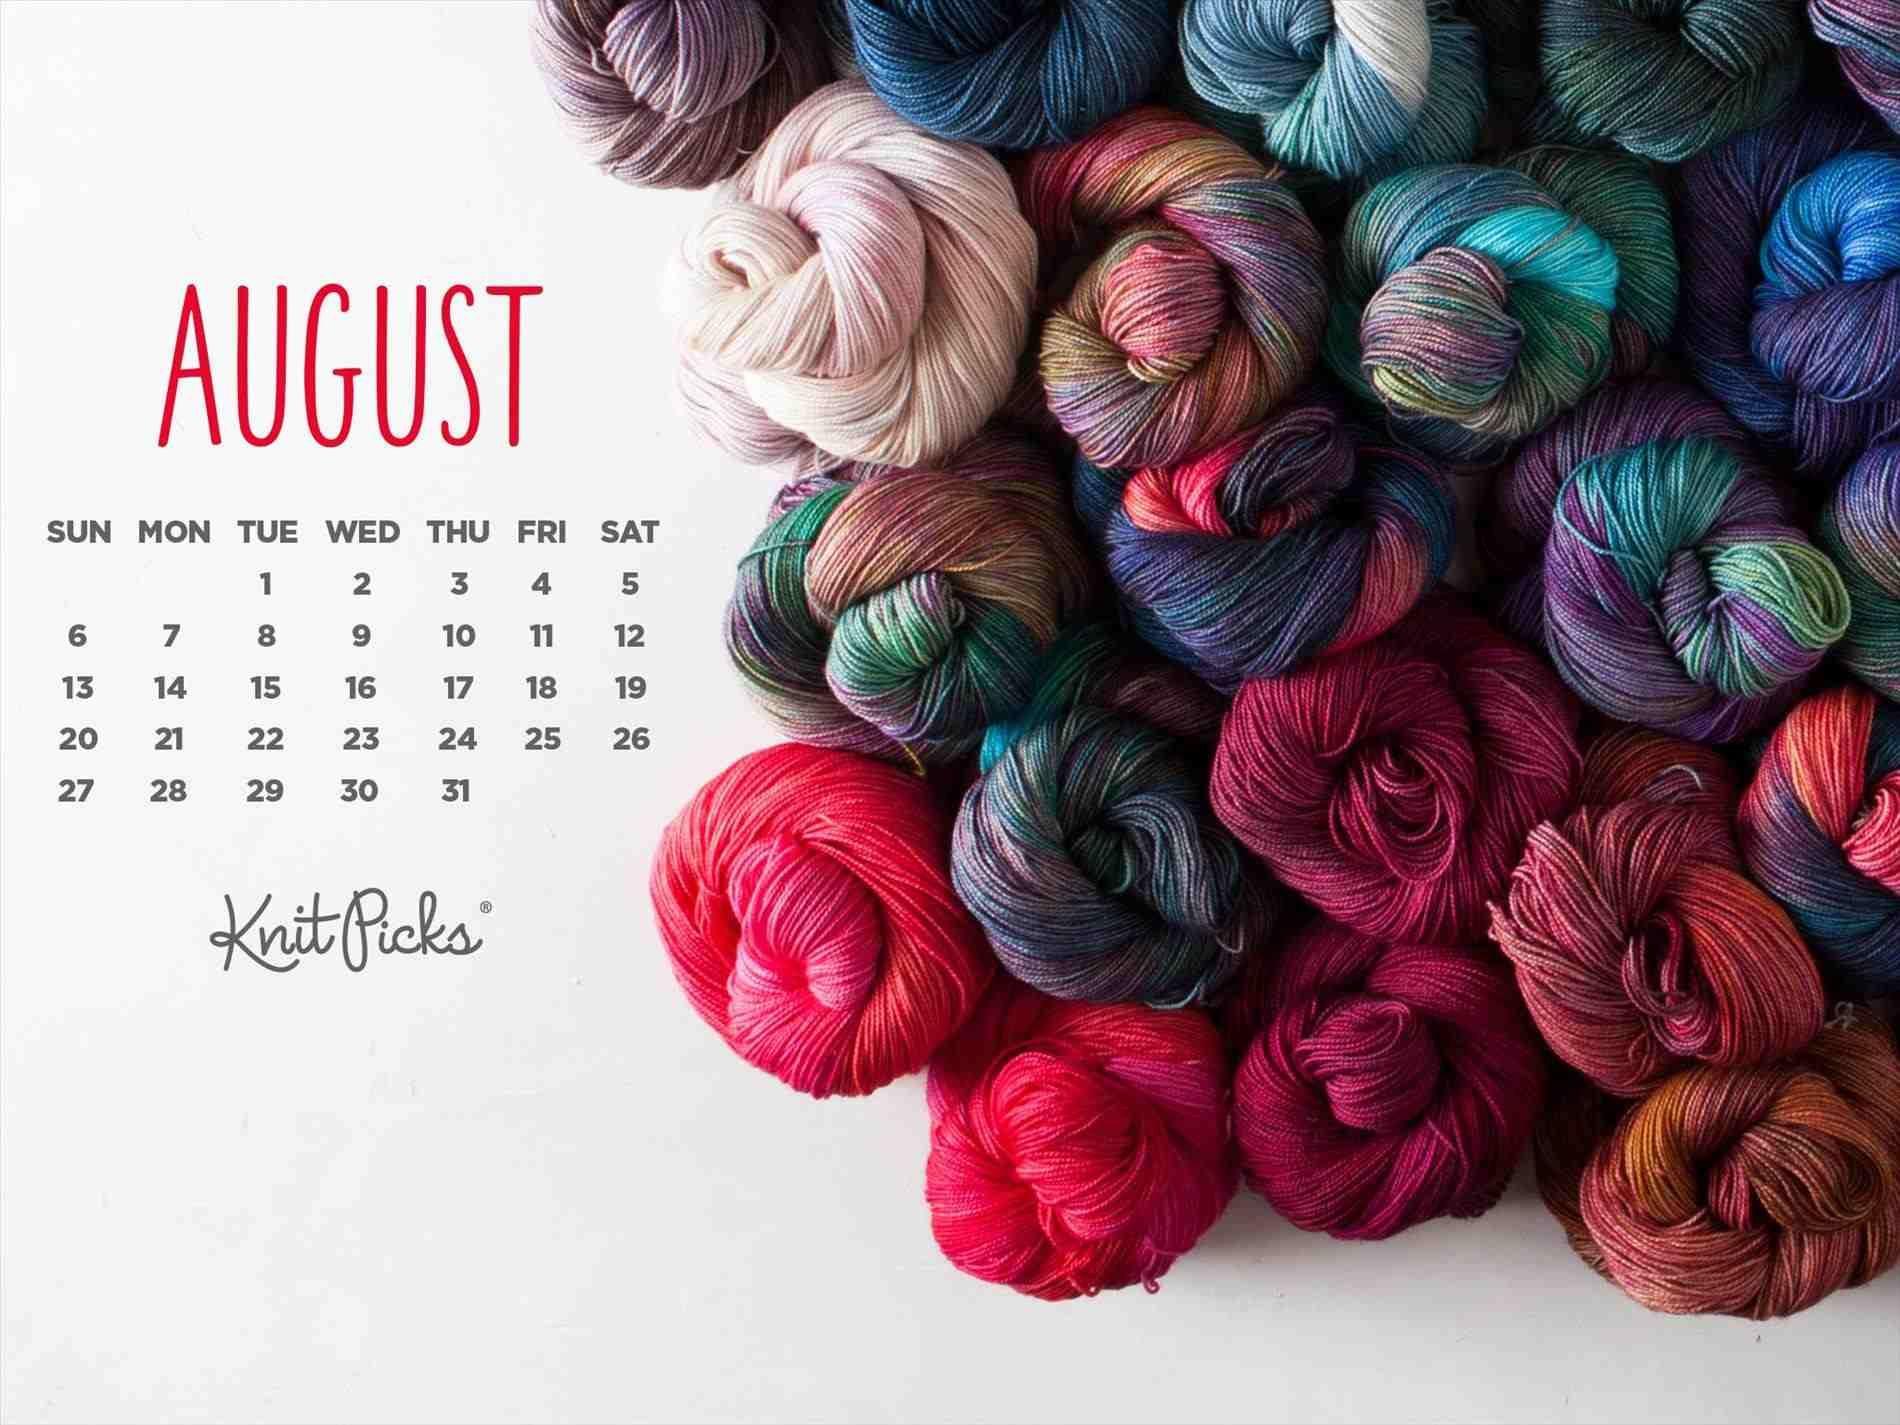 Crochet Top 2012 Knitting Blogs Knit Picks Knitting